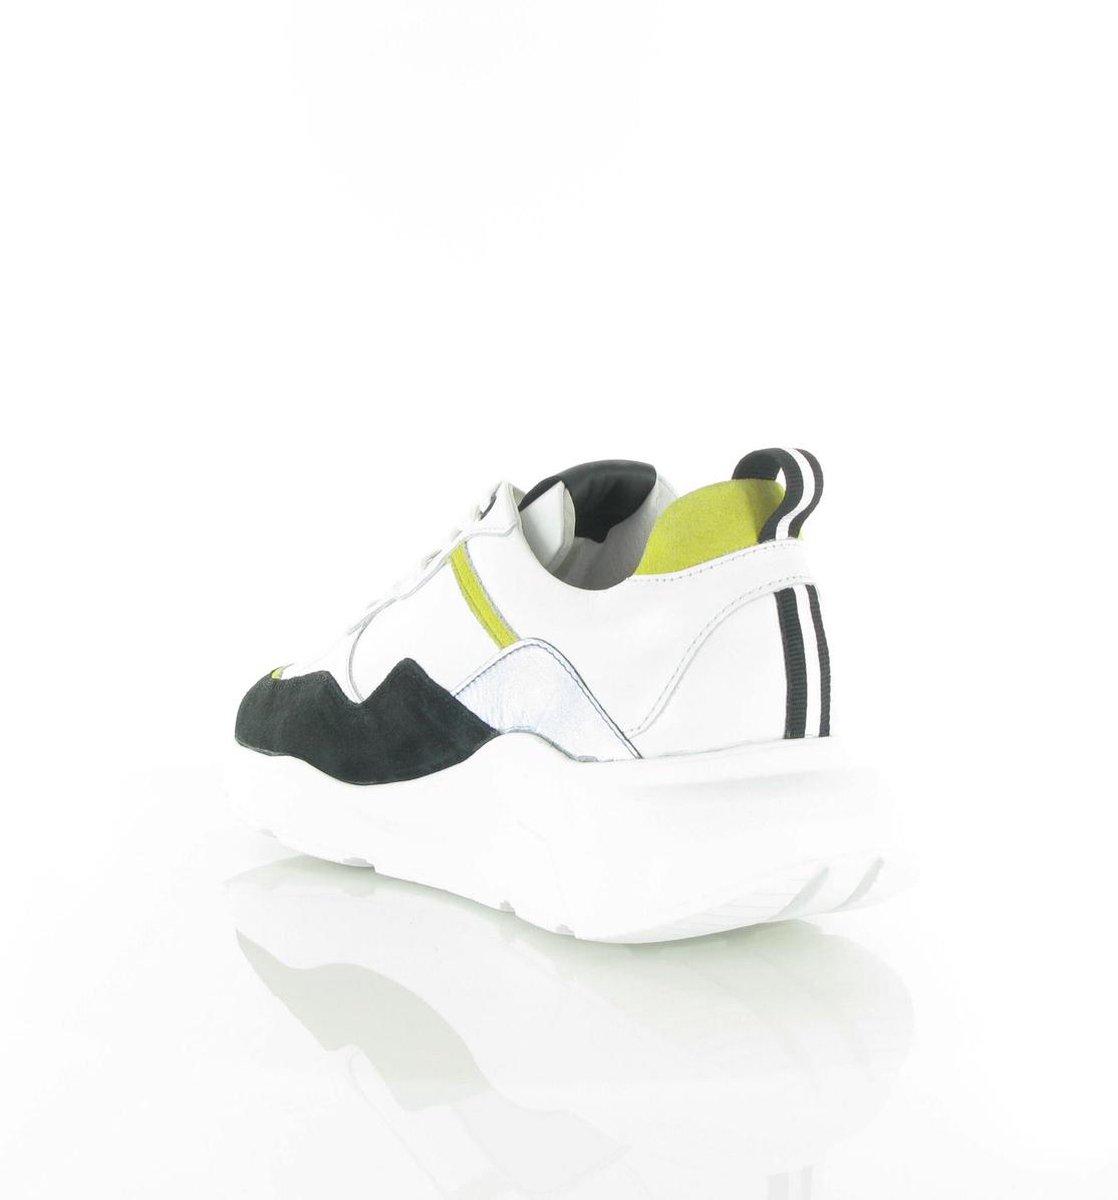 Blackstone Mannen Sneakers -  Tg43 - Wit - Maat 41 Sneakers